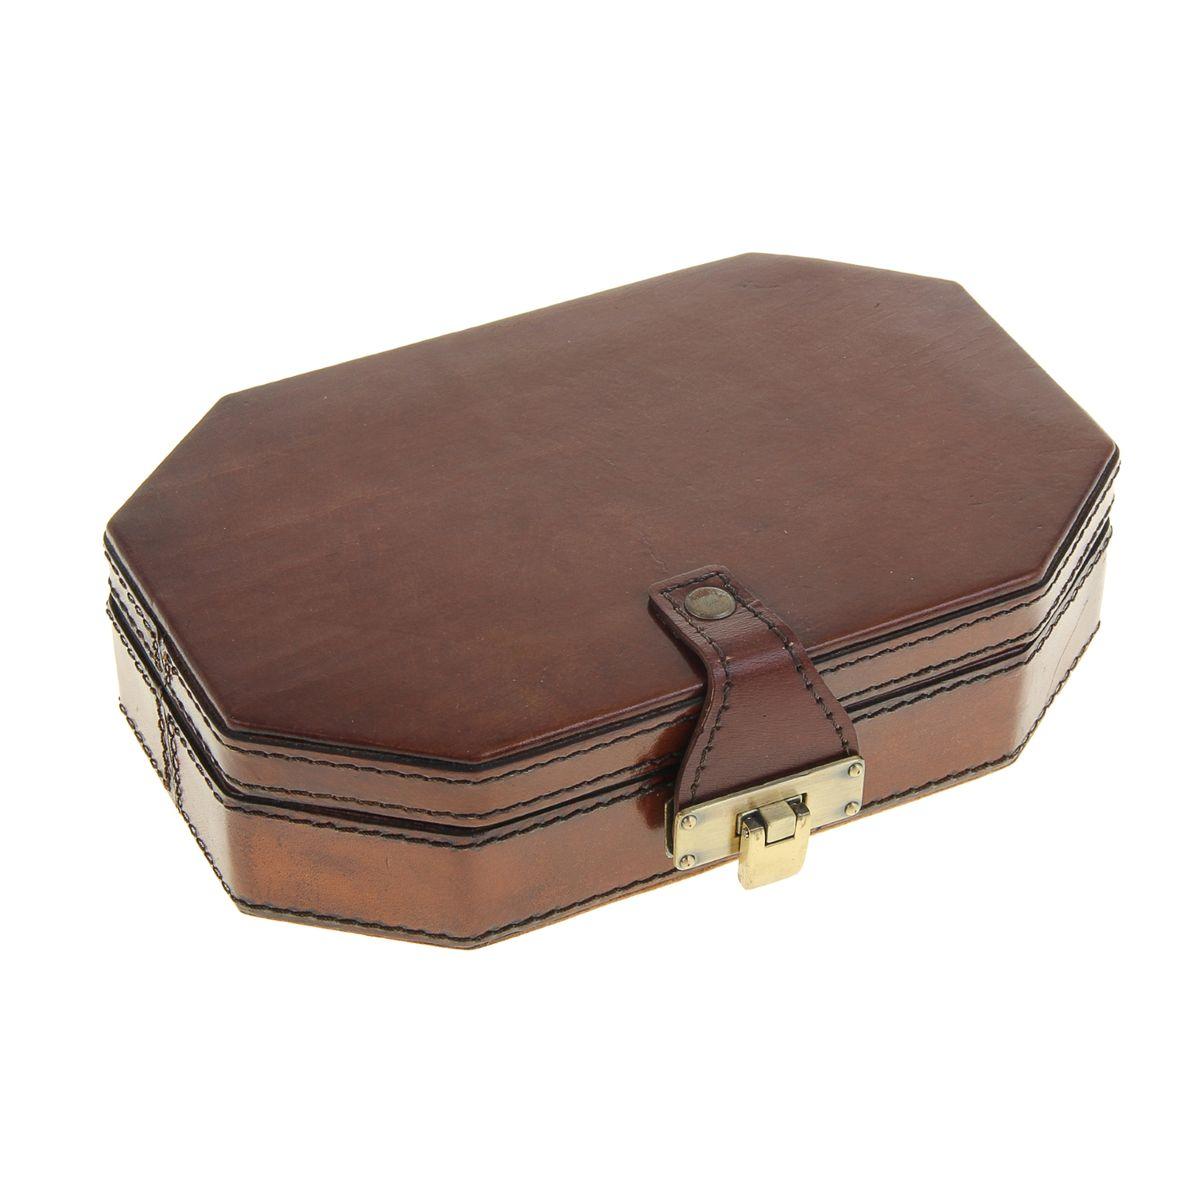 "Шкатулка Sima-land ""Многогранник"", цвет: коричневый, 21 х 13,5 х 5 см"